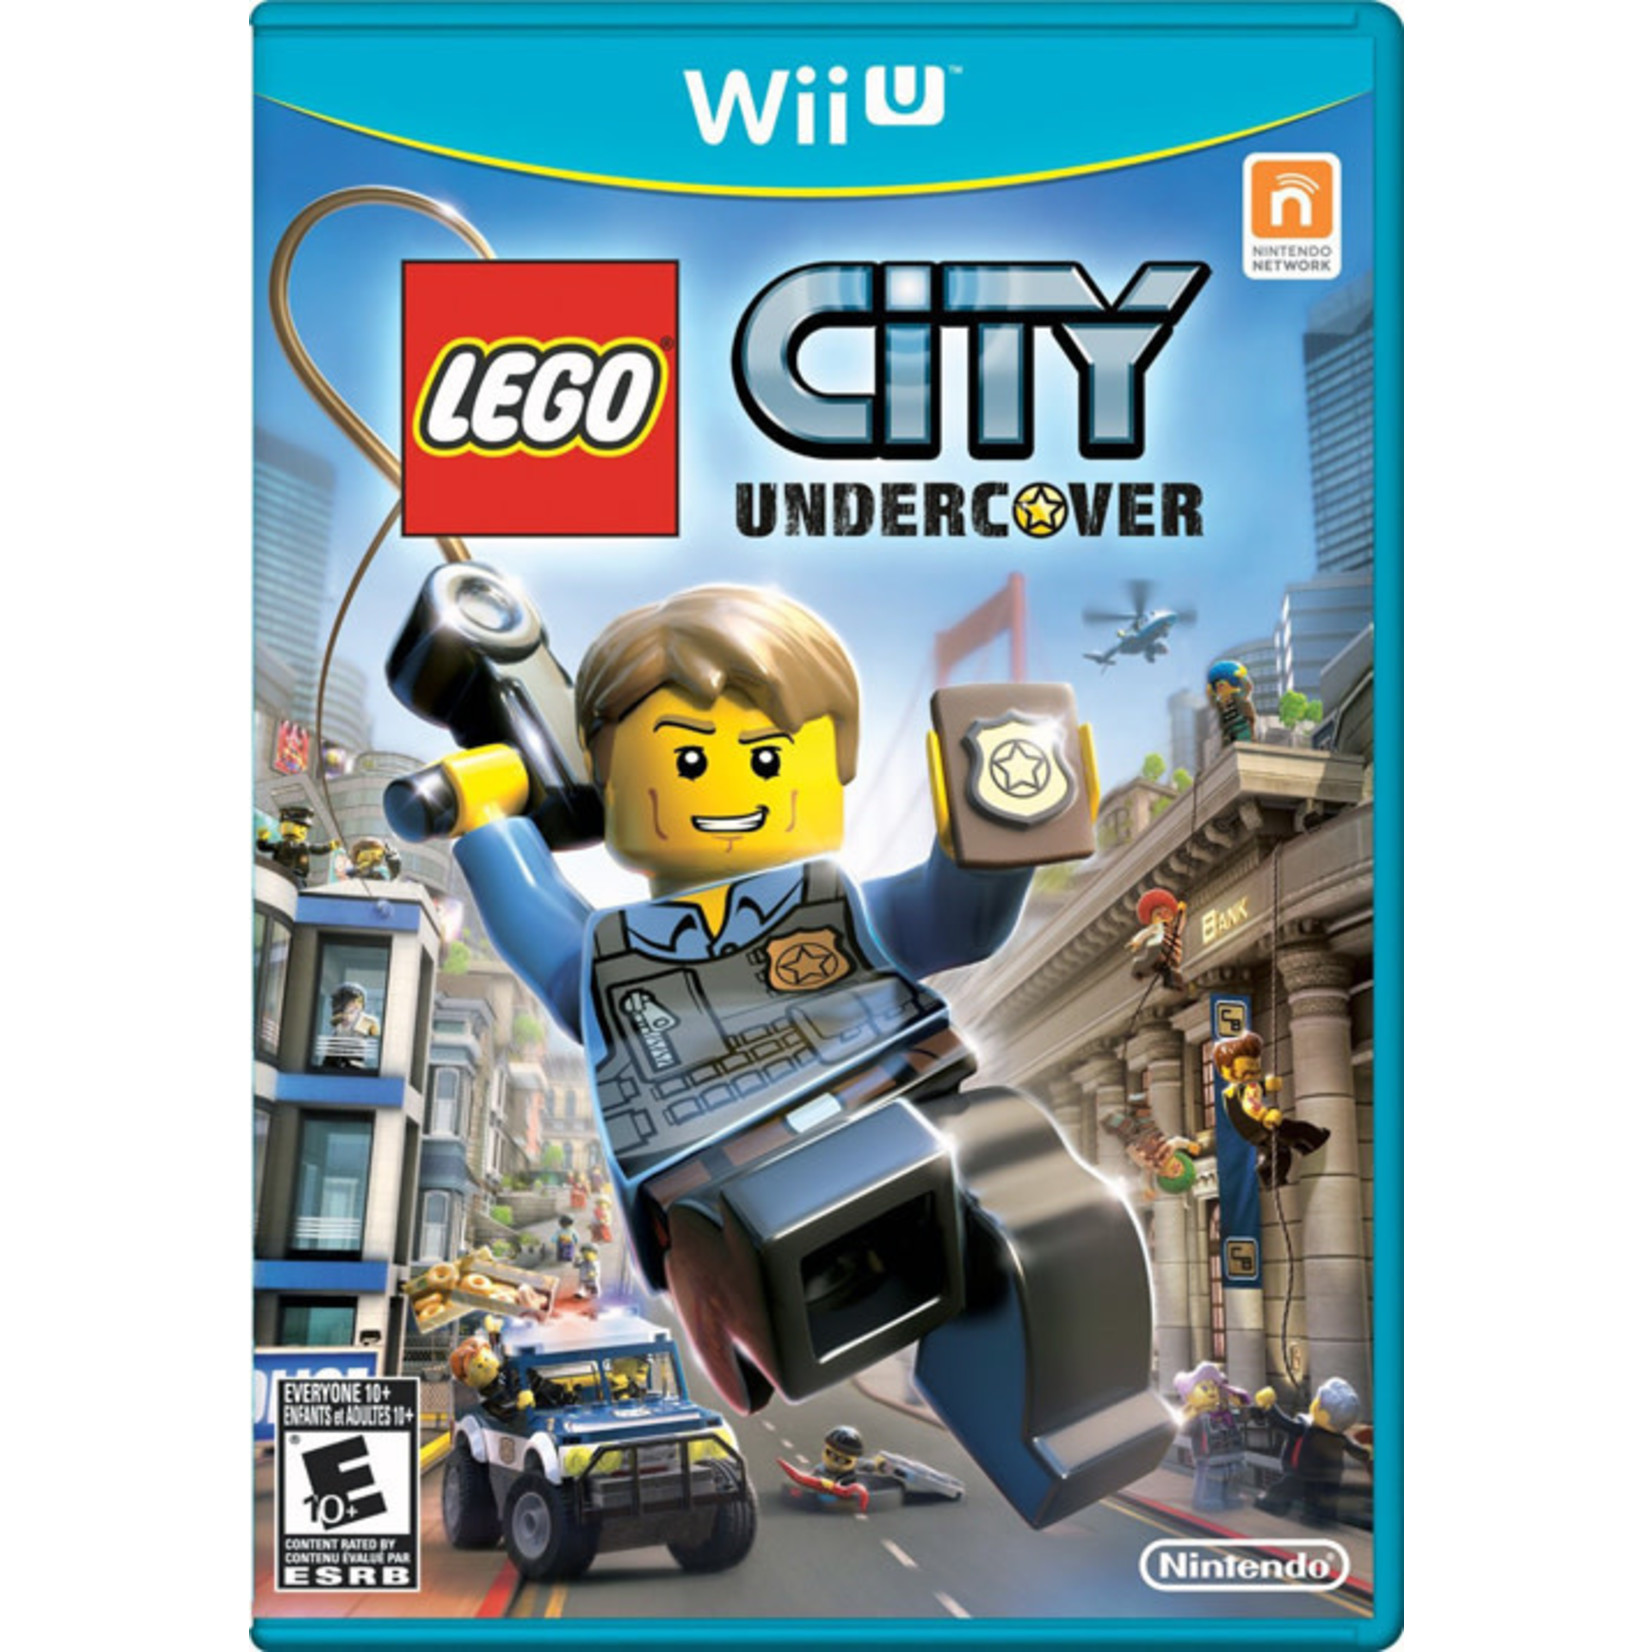 WIIUUSD-LEGO City: Undercover